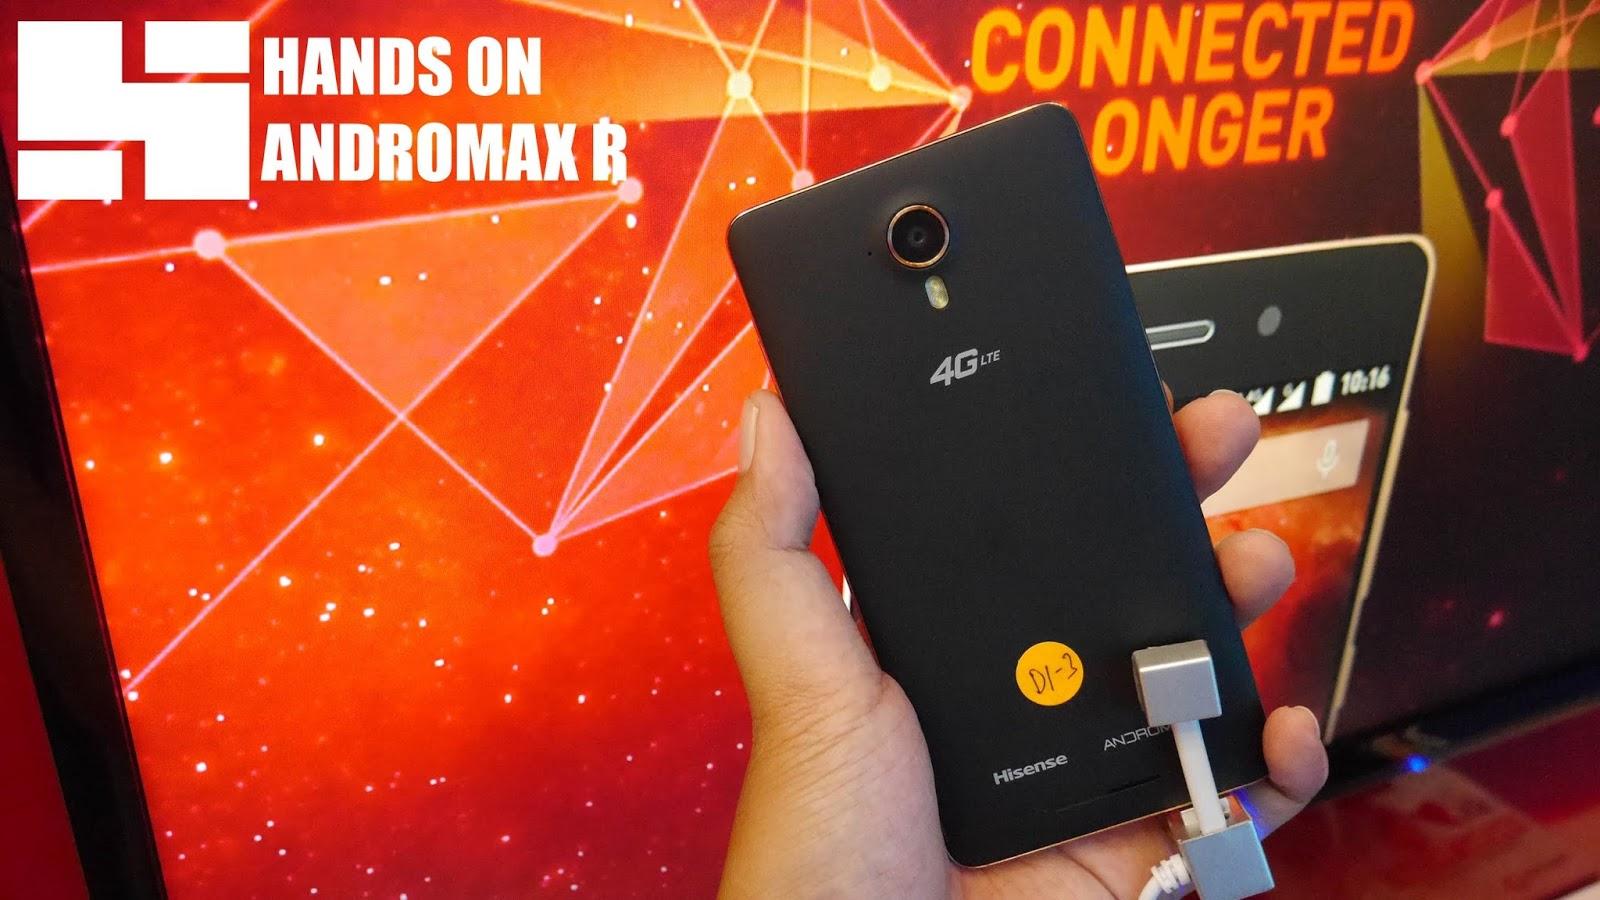 Harga Hape Smartfren Andromax Ec 4G LTE